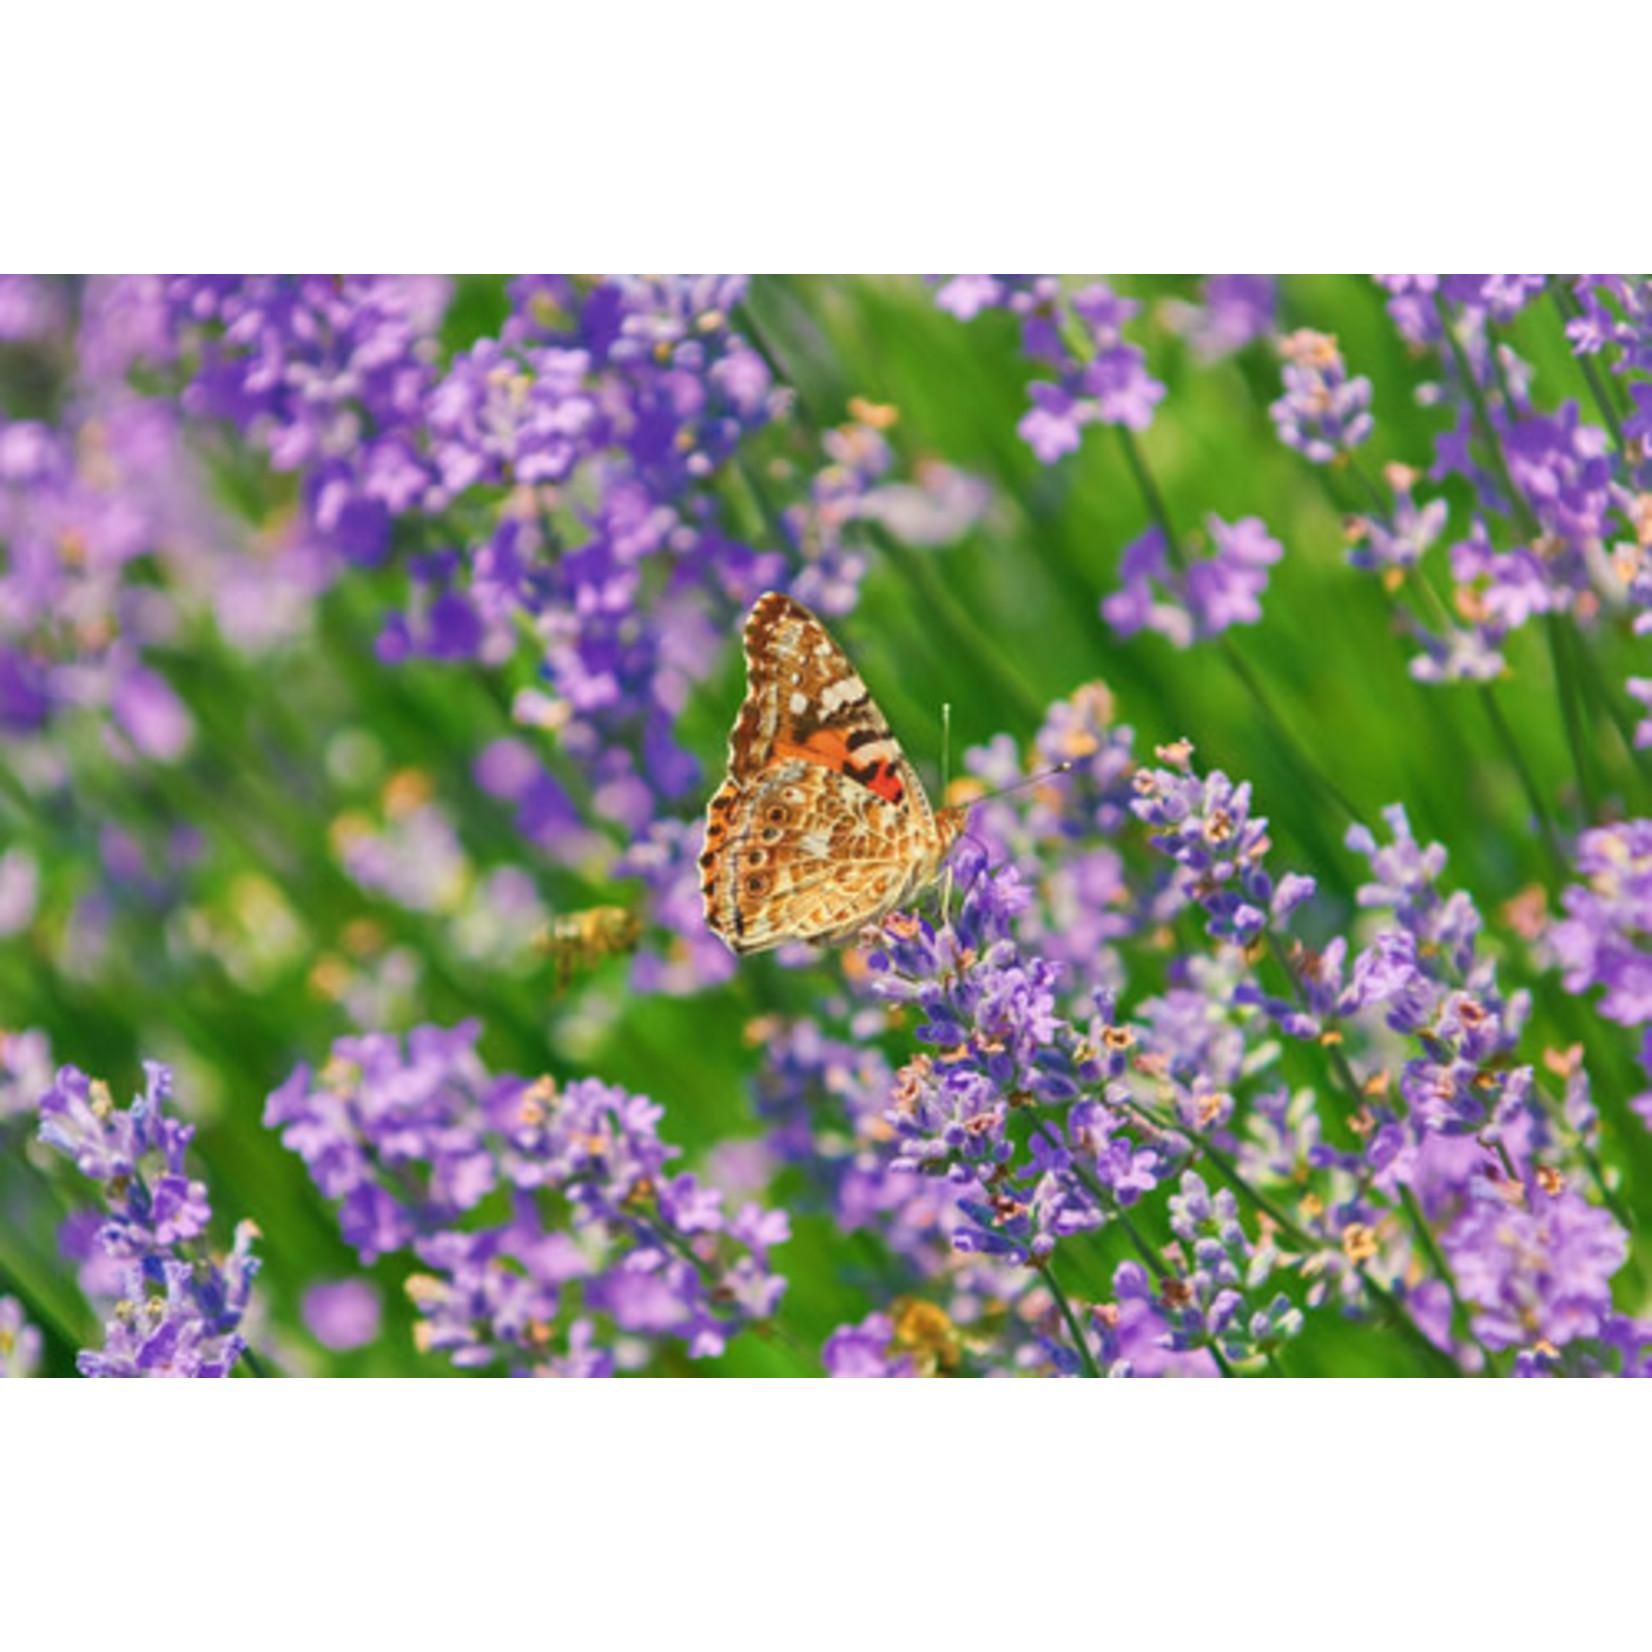 Lavender - Lavandula Phenomenal